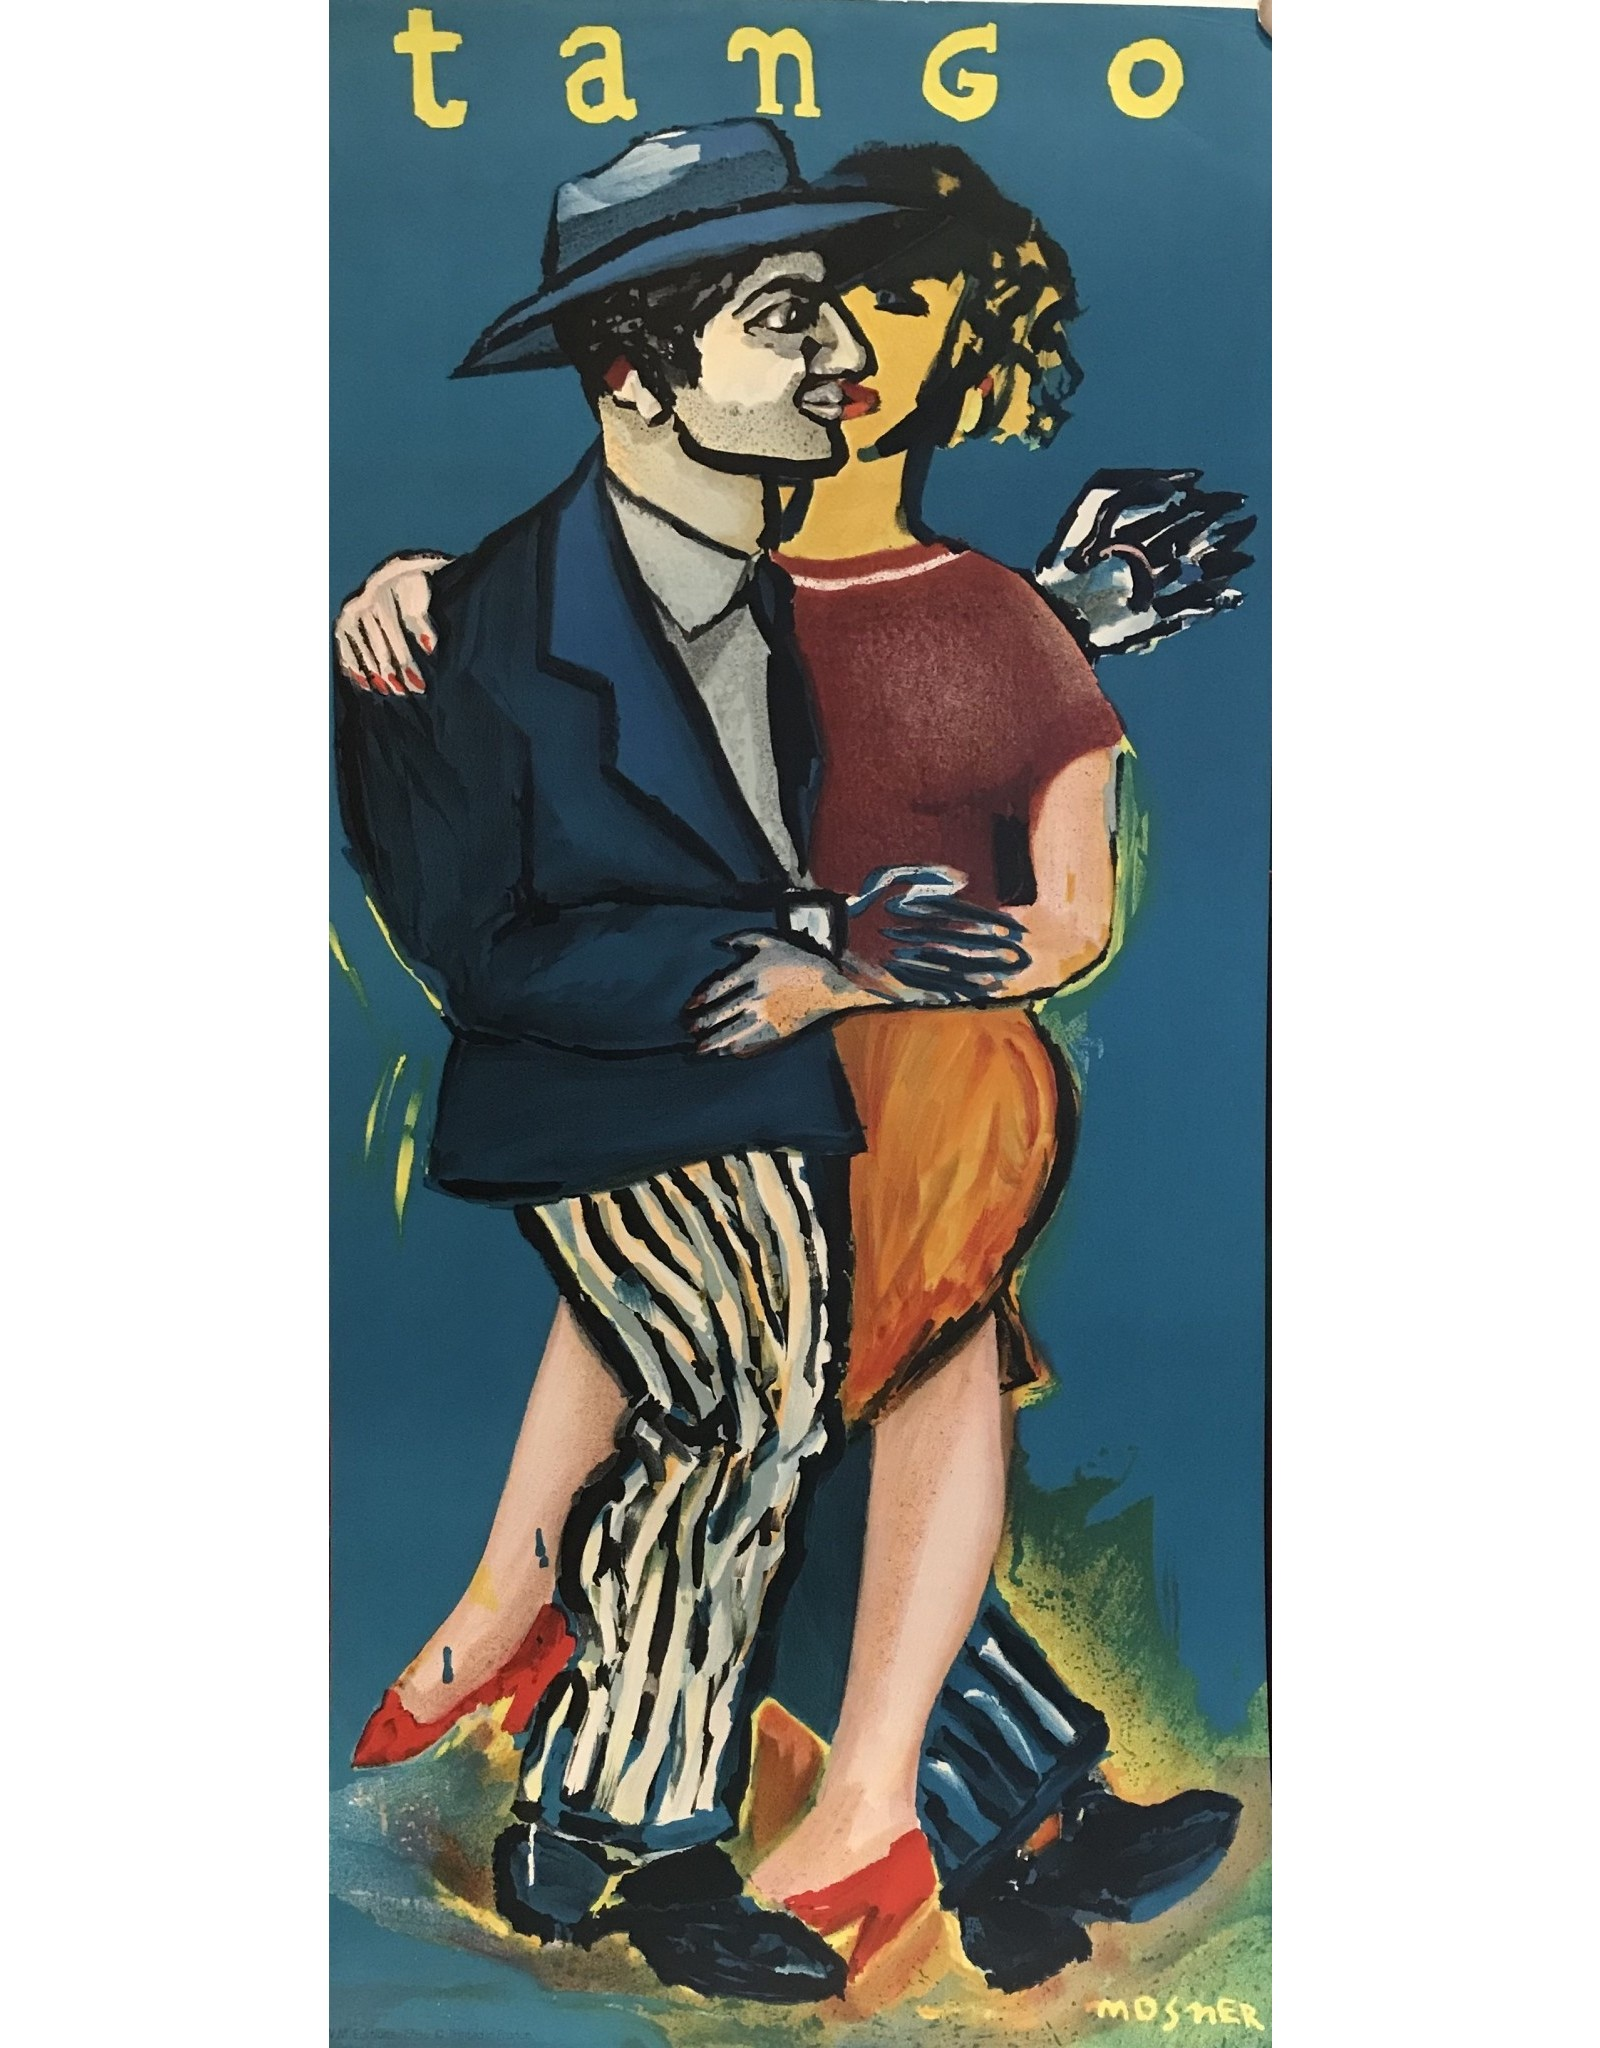 SPV Tango by Ricardo Mosner